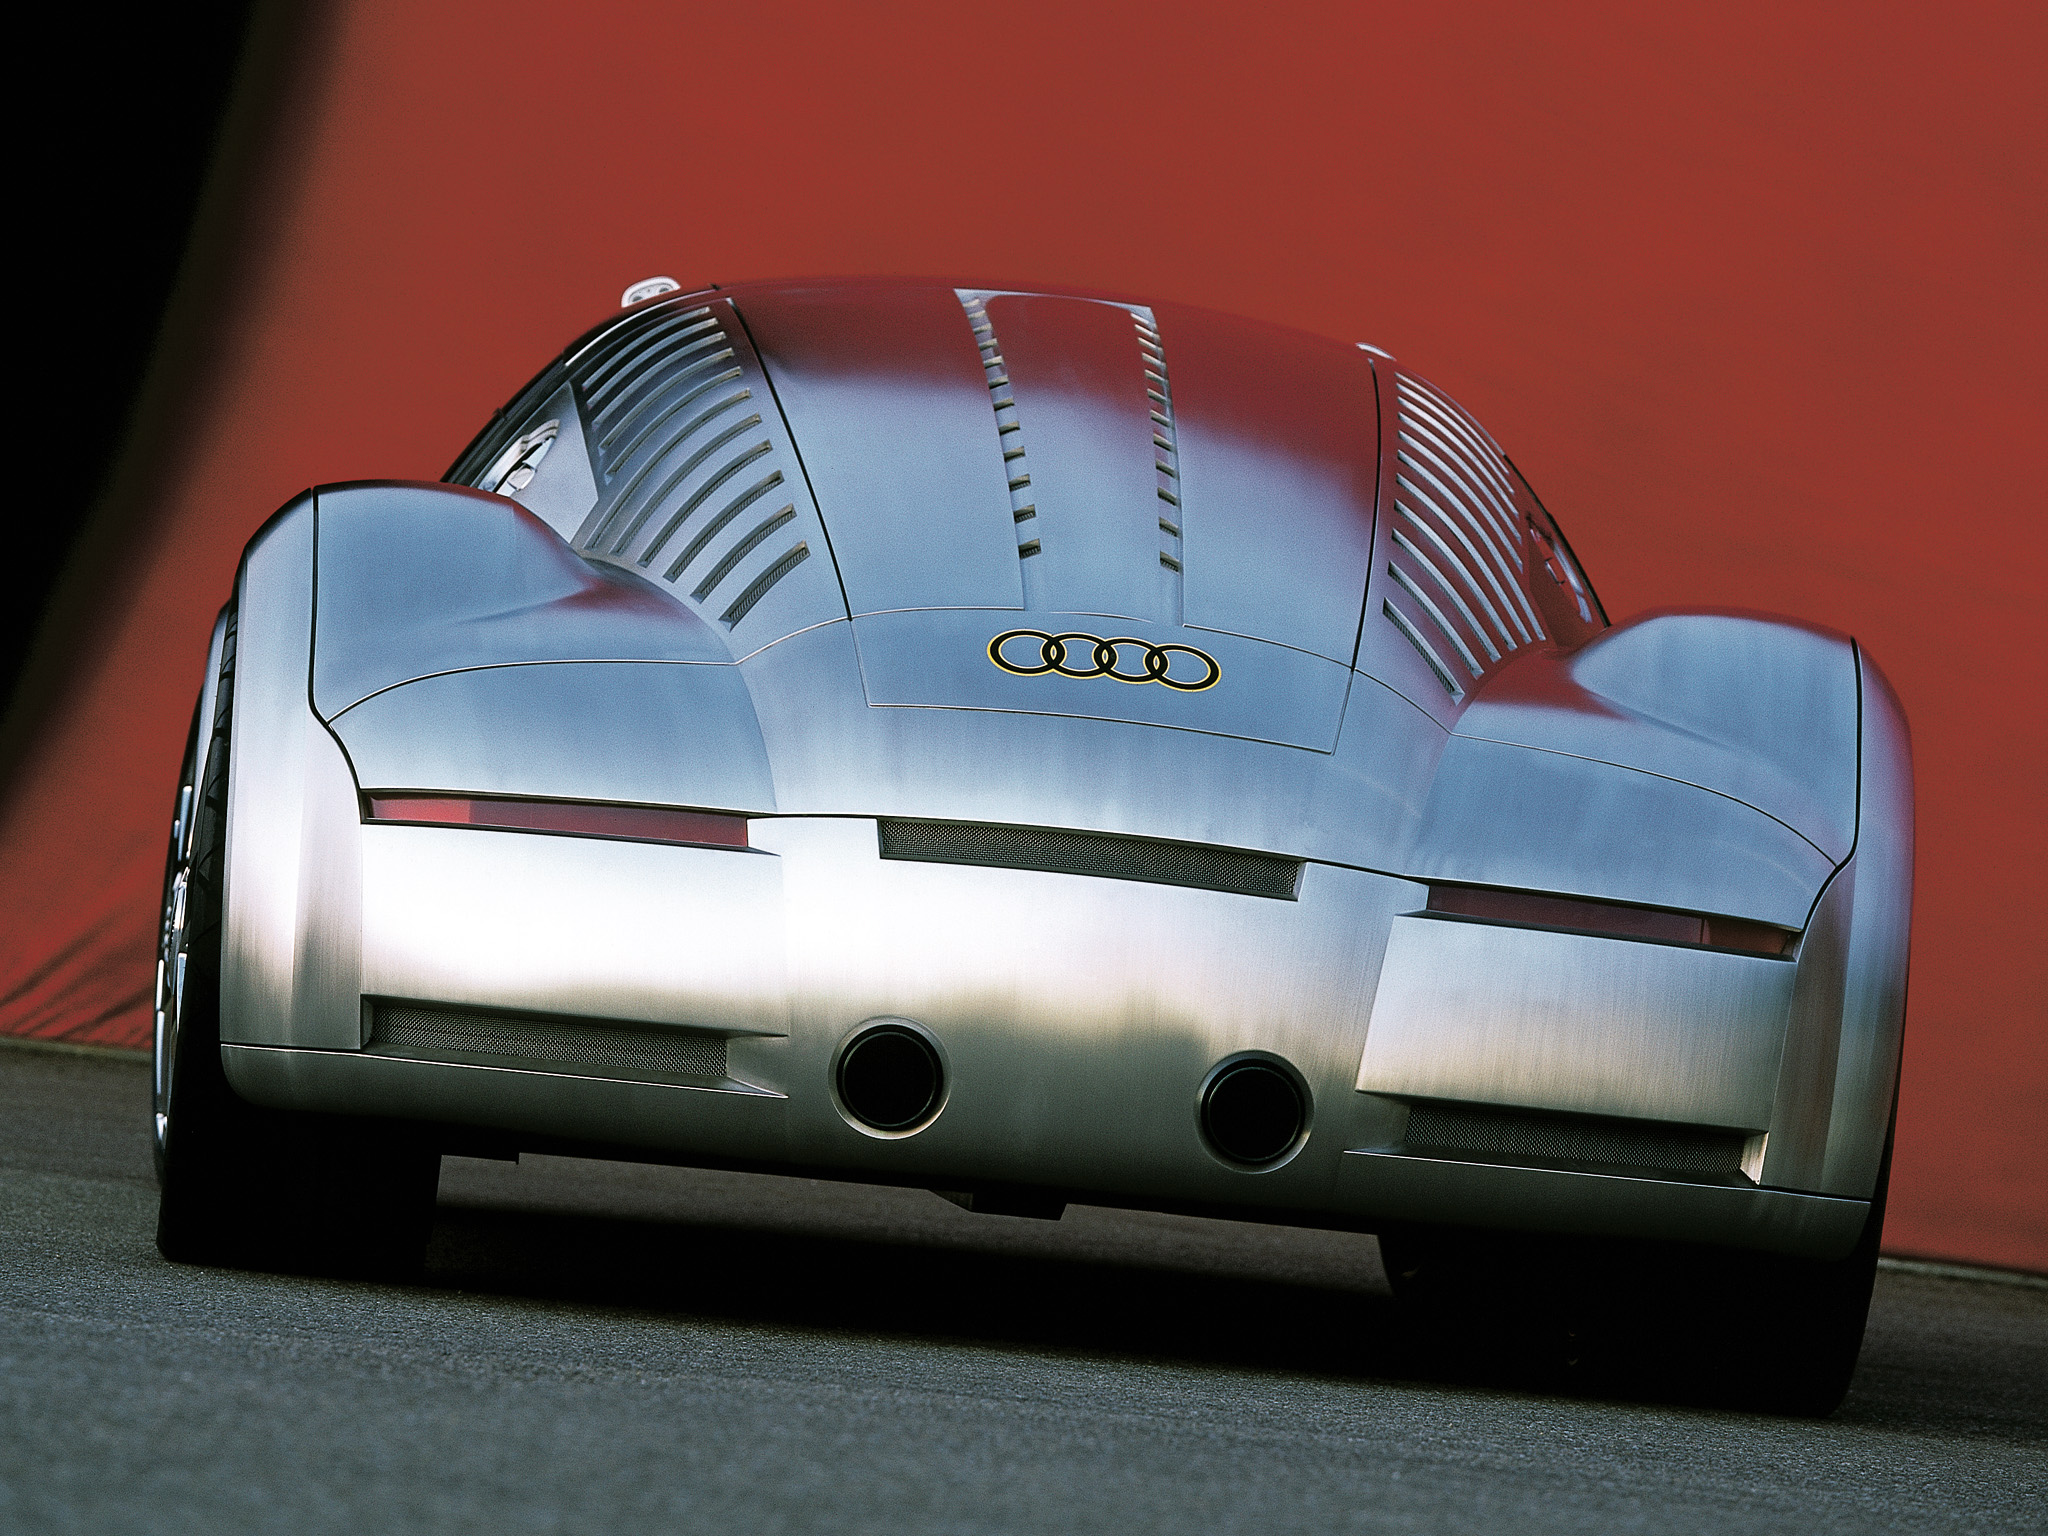 #2 Audi Rosemeyer Concept